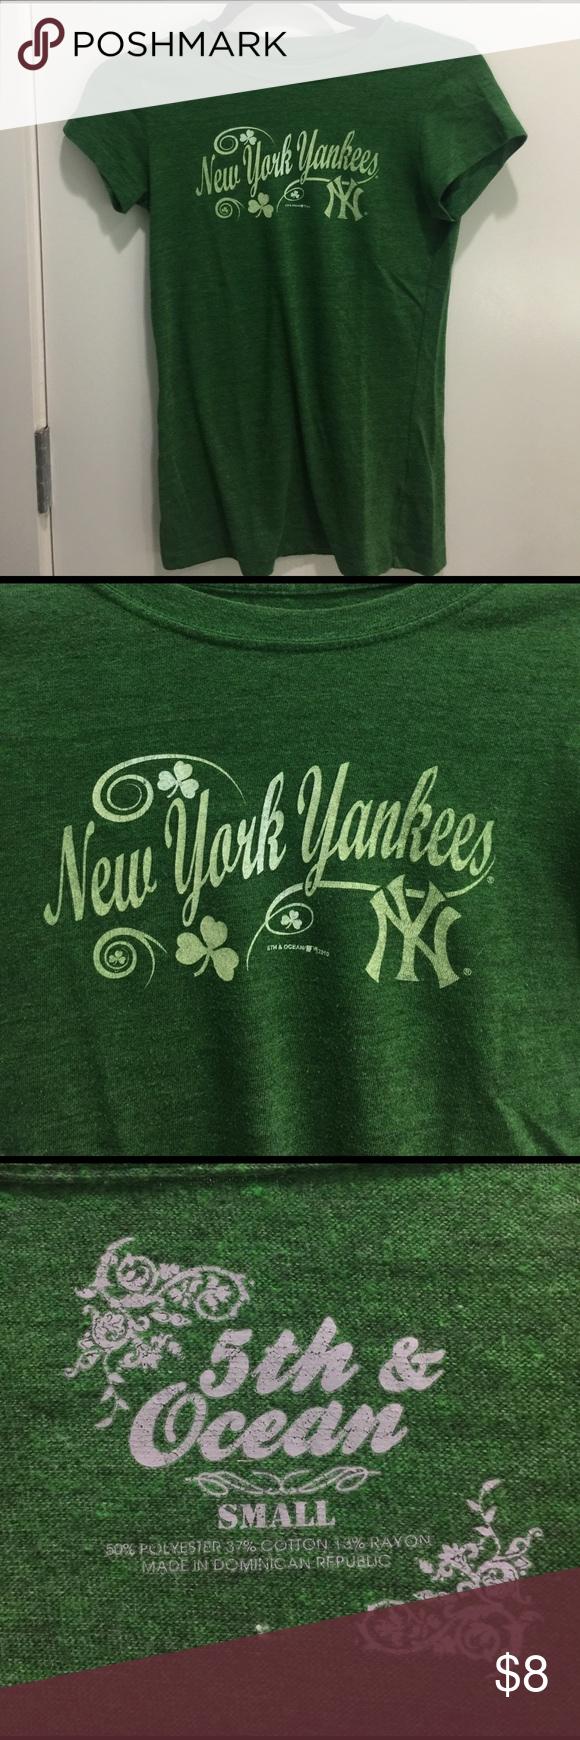 NY Yankees St. Patrick s Day T-shirt New York Yankees St. Patrick s Day  edition T-shirt by 5th   Ocean. World Series year! 5th   Ocean Tops Tees -  Short ... 59bb702945f